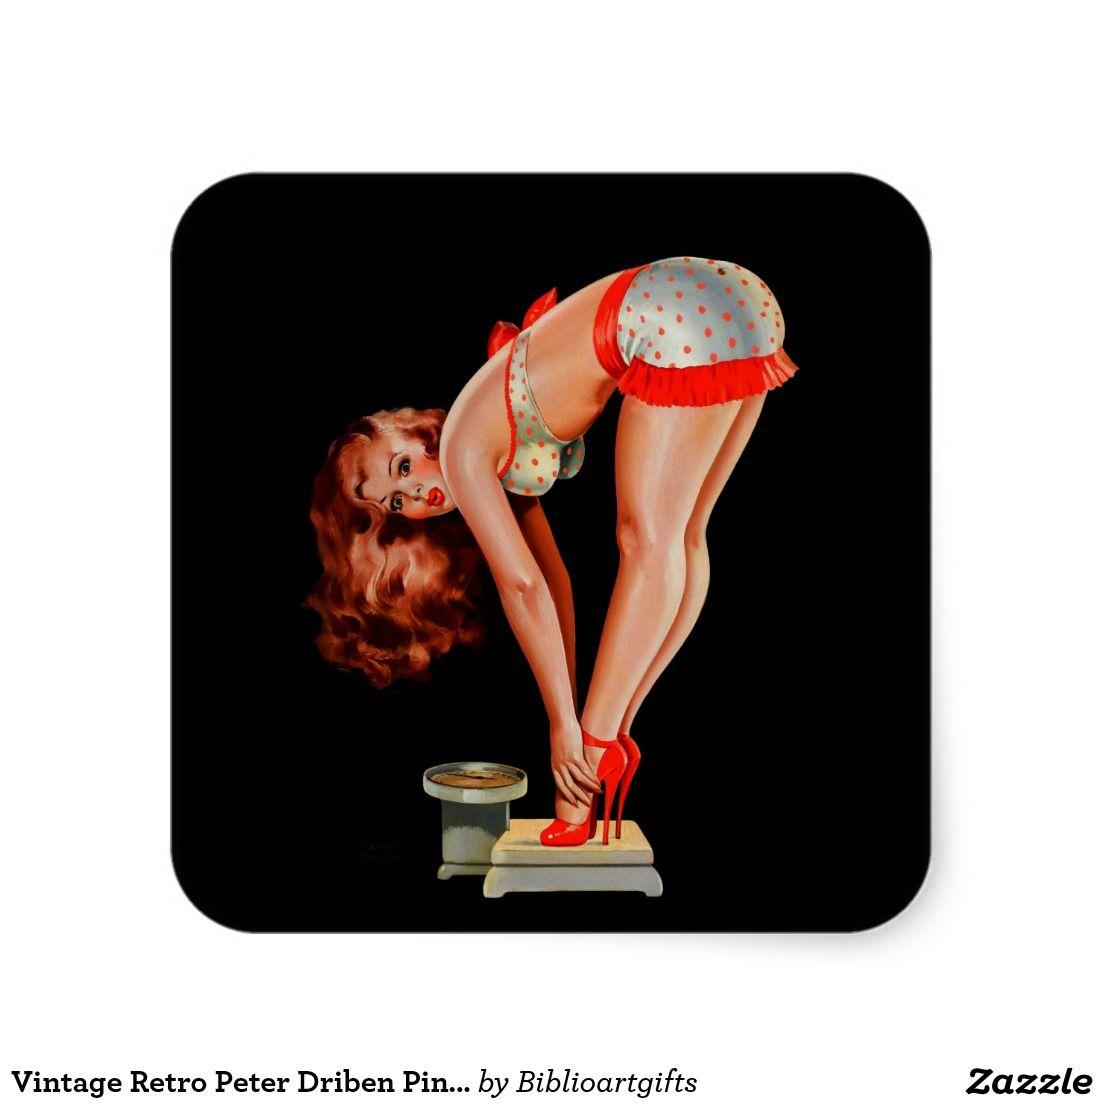 264c1d437eff0b Vintage Retro Peter Driben Pinup Girl on Scale Square Sticker ...